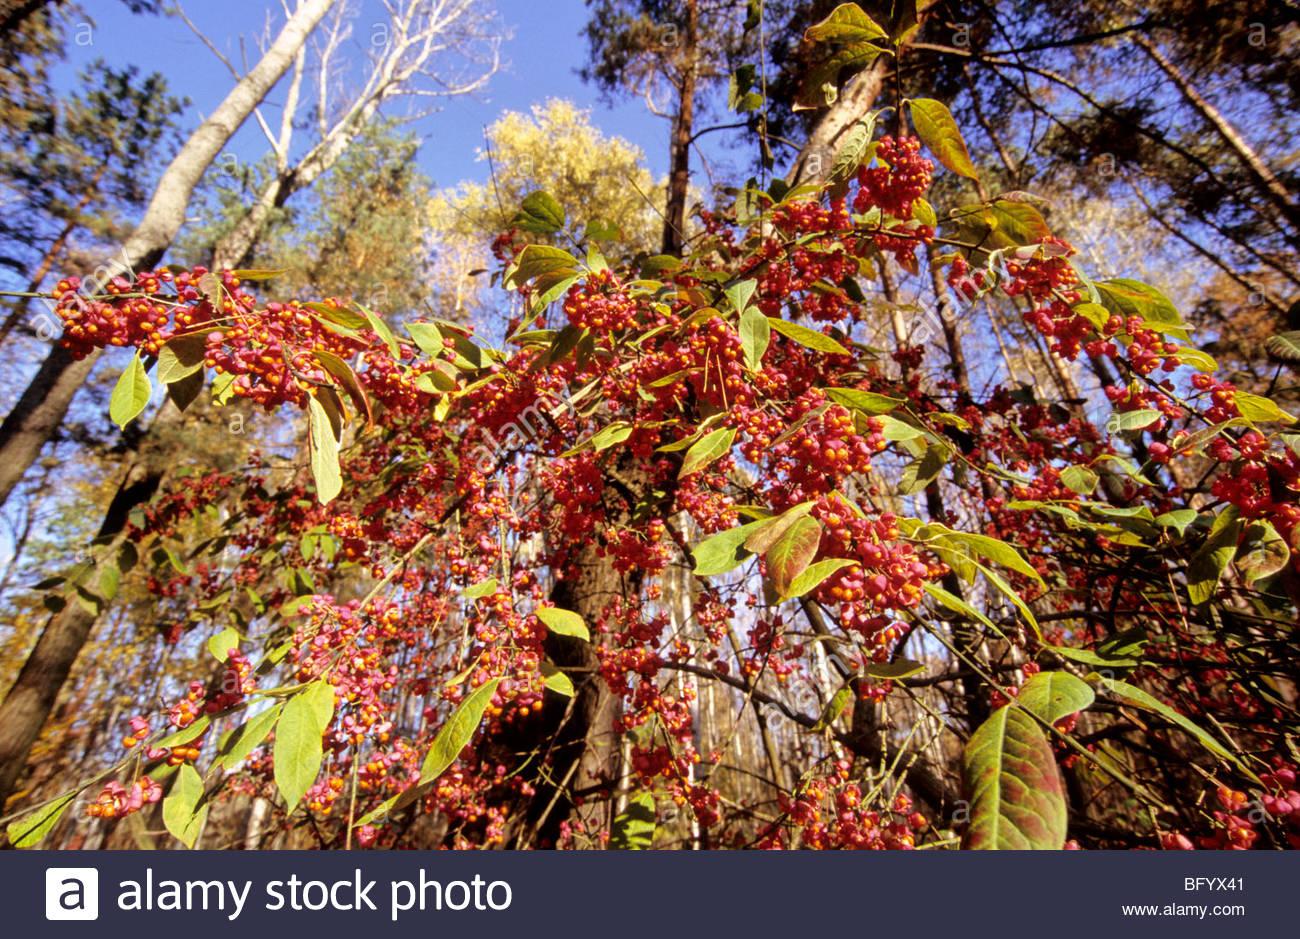 Spindelstrauch, Spindel tree - Stock Image